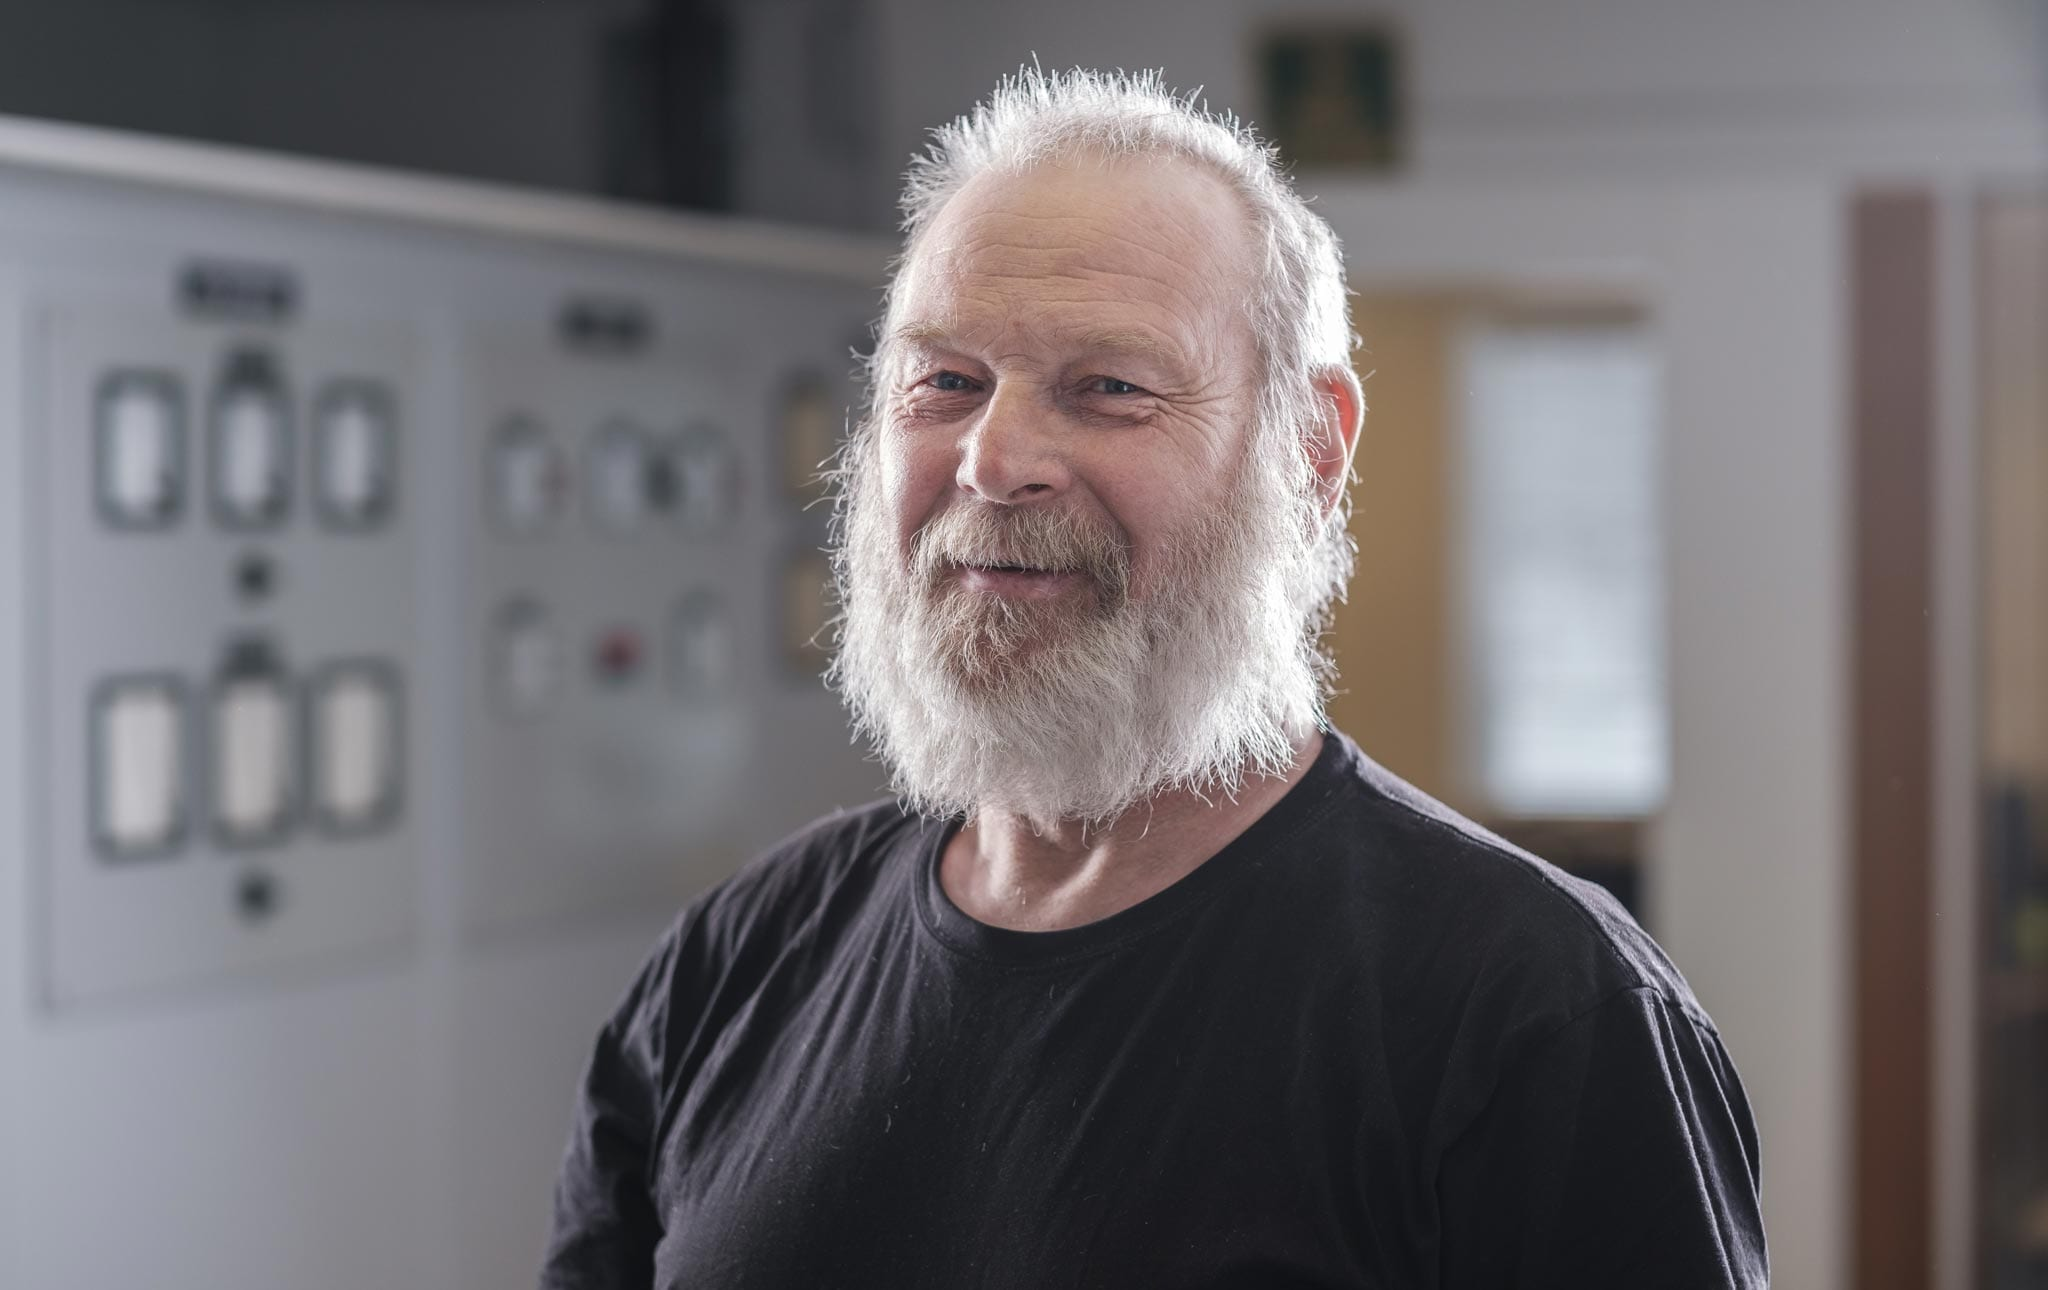 Jon Bjørnar Engan